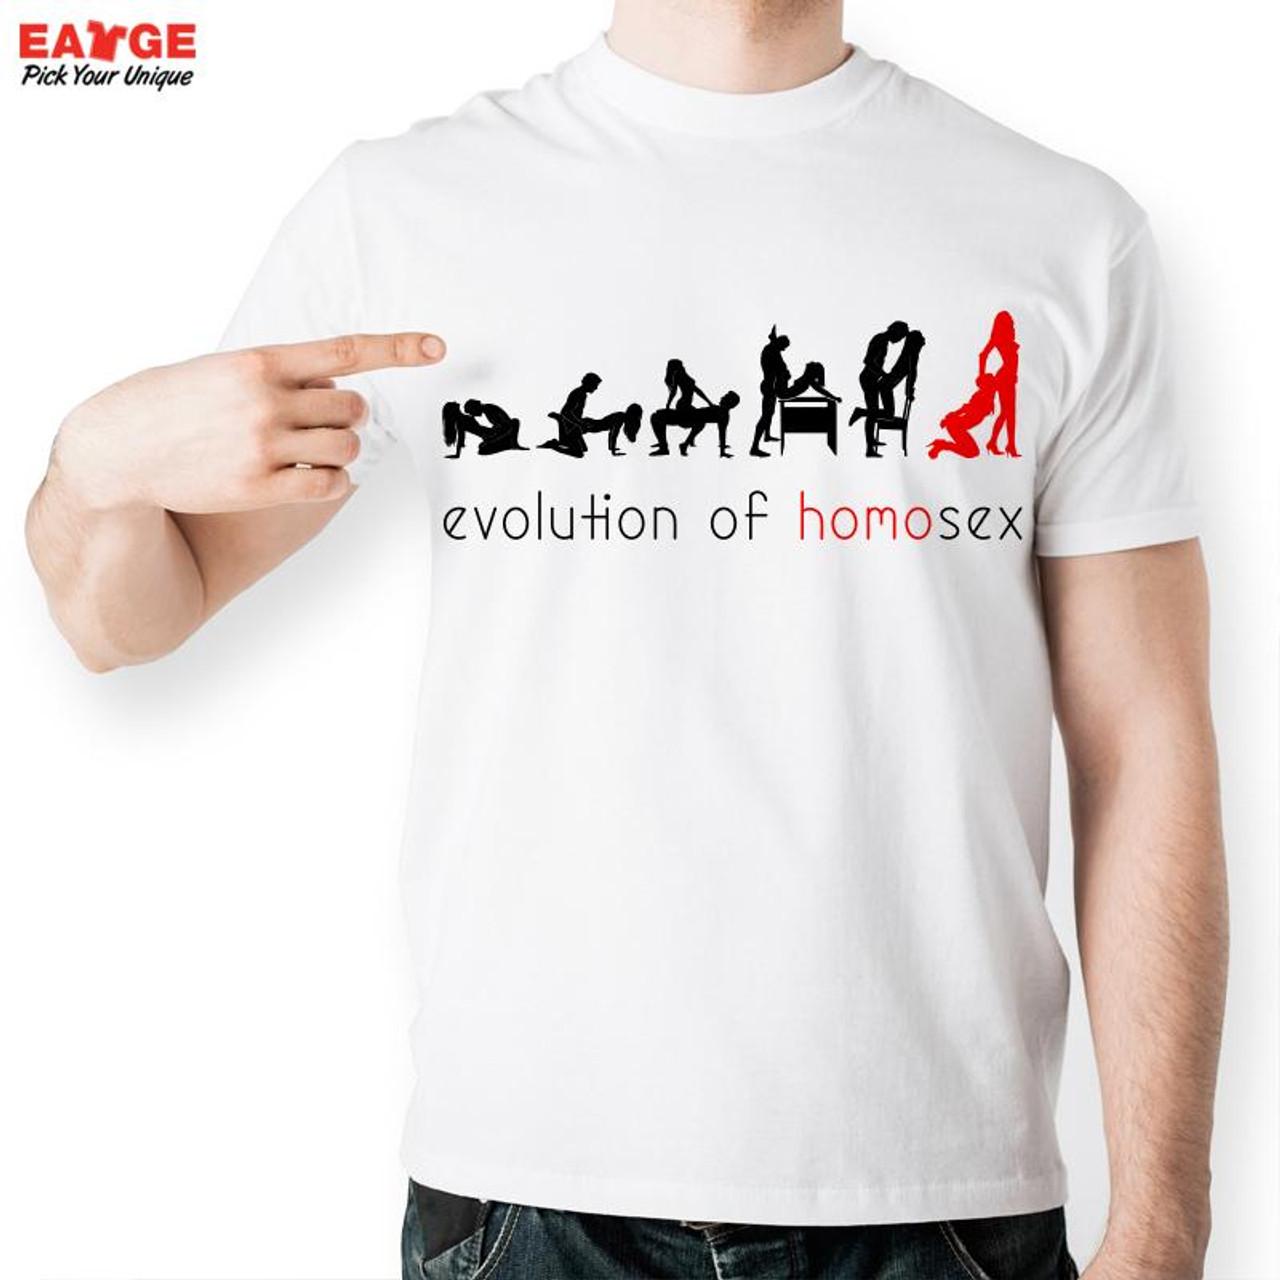 65f1aea7 New Men Sexy Design T shirt Fashion White Print Short Sleeve O-neck Sex  Love ...